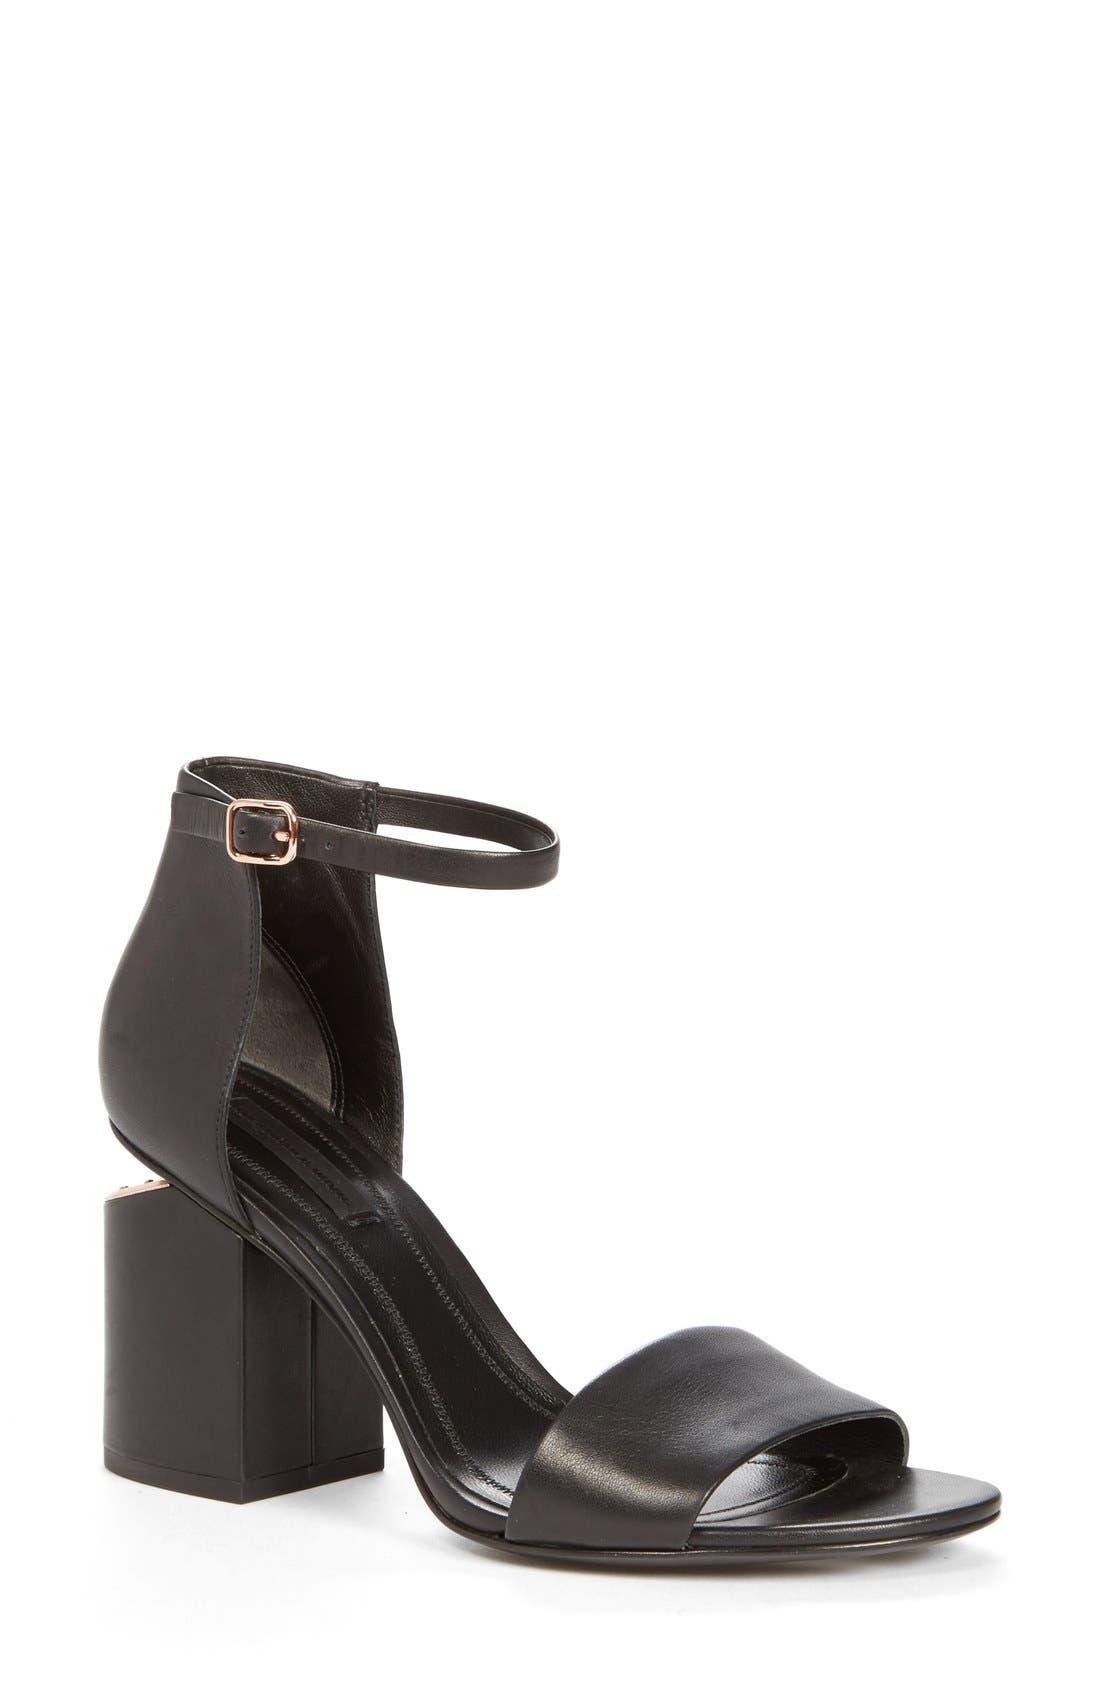 ALEXANDER WANG 'Abby' Ankle Strap Sandal, Main, color, 001